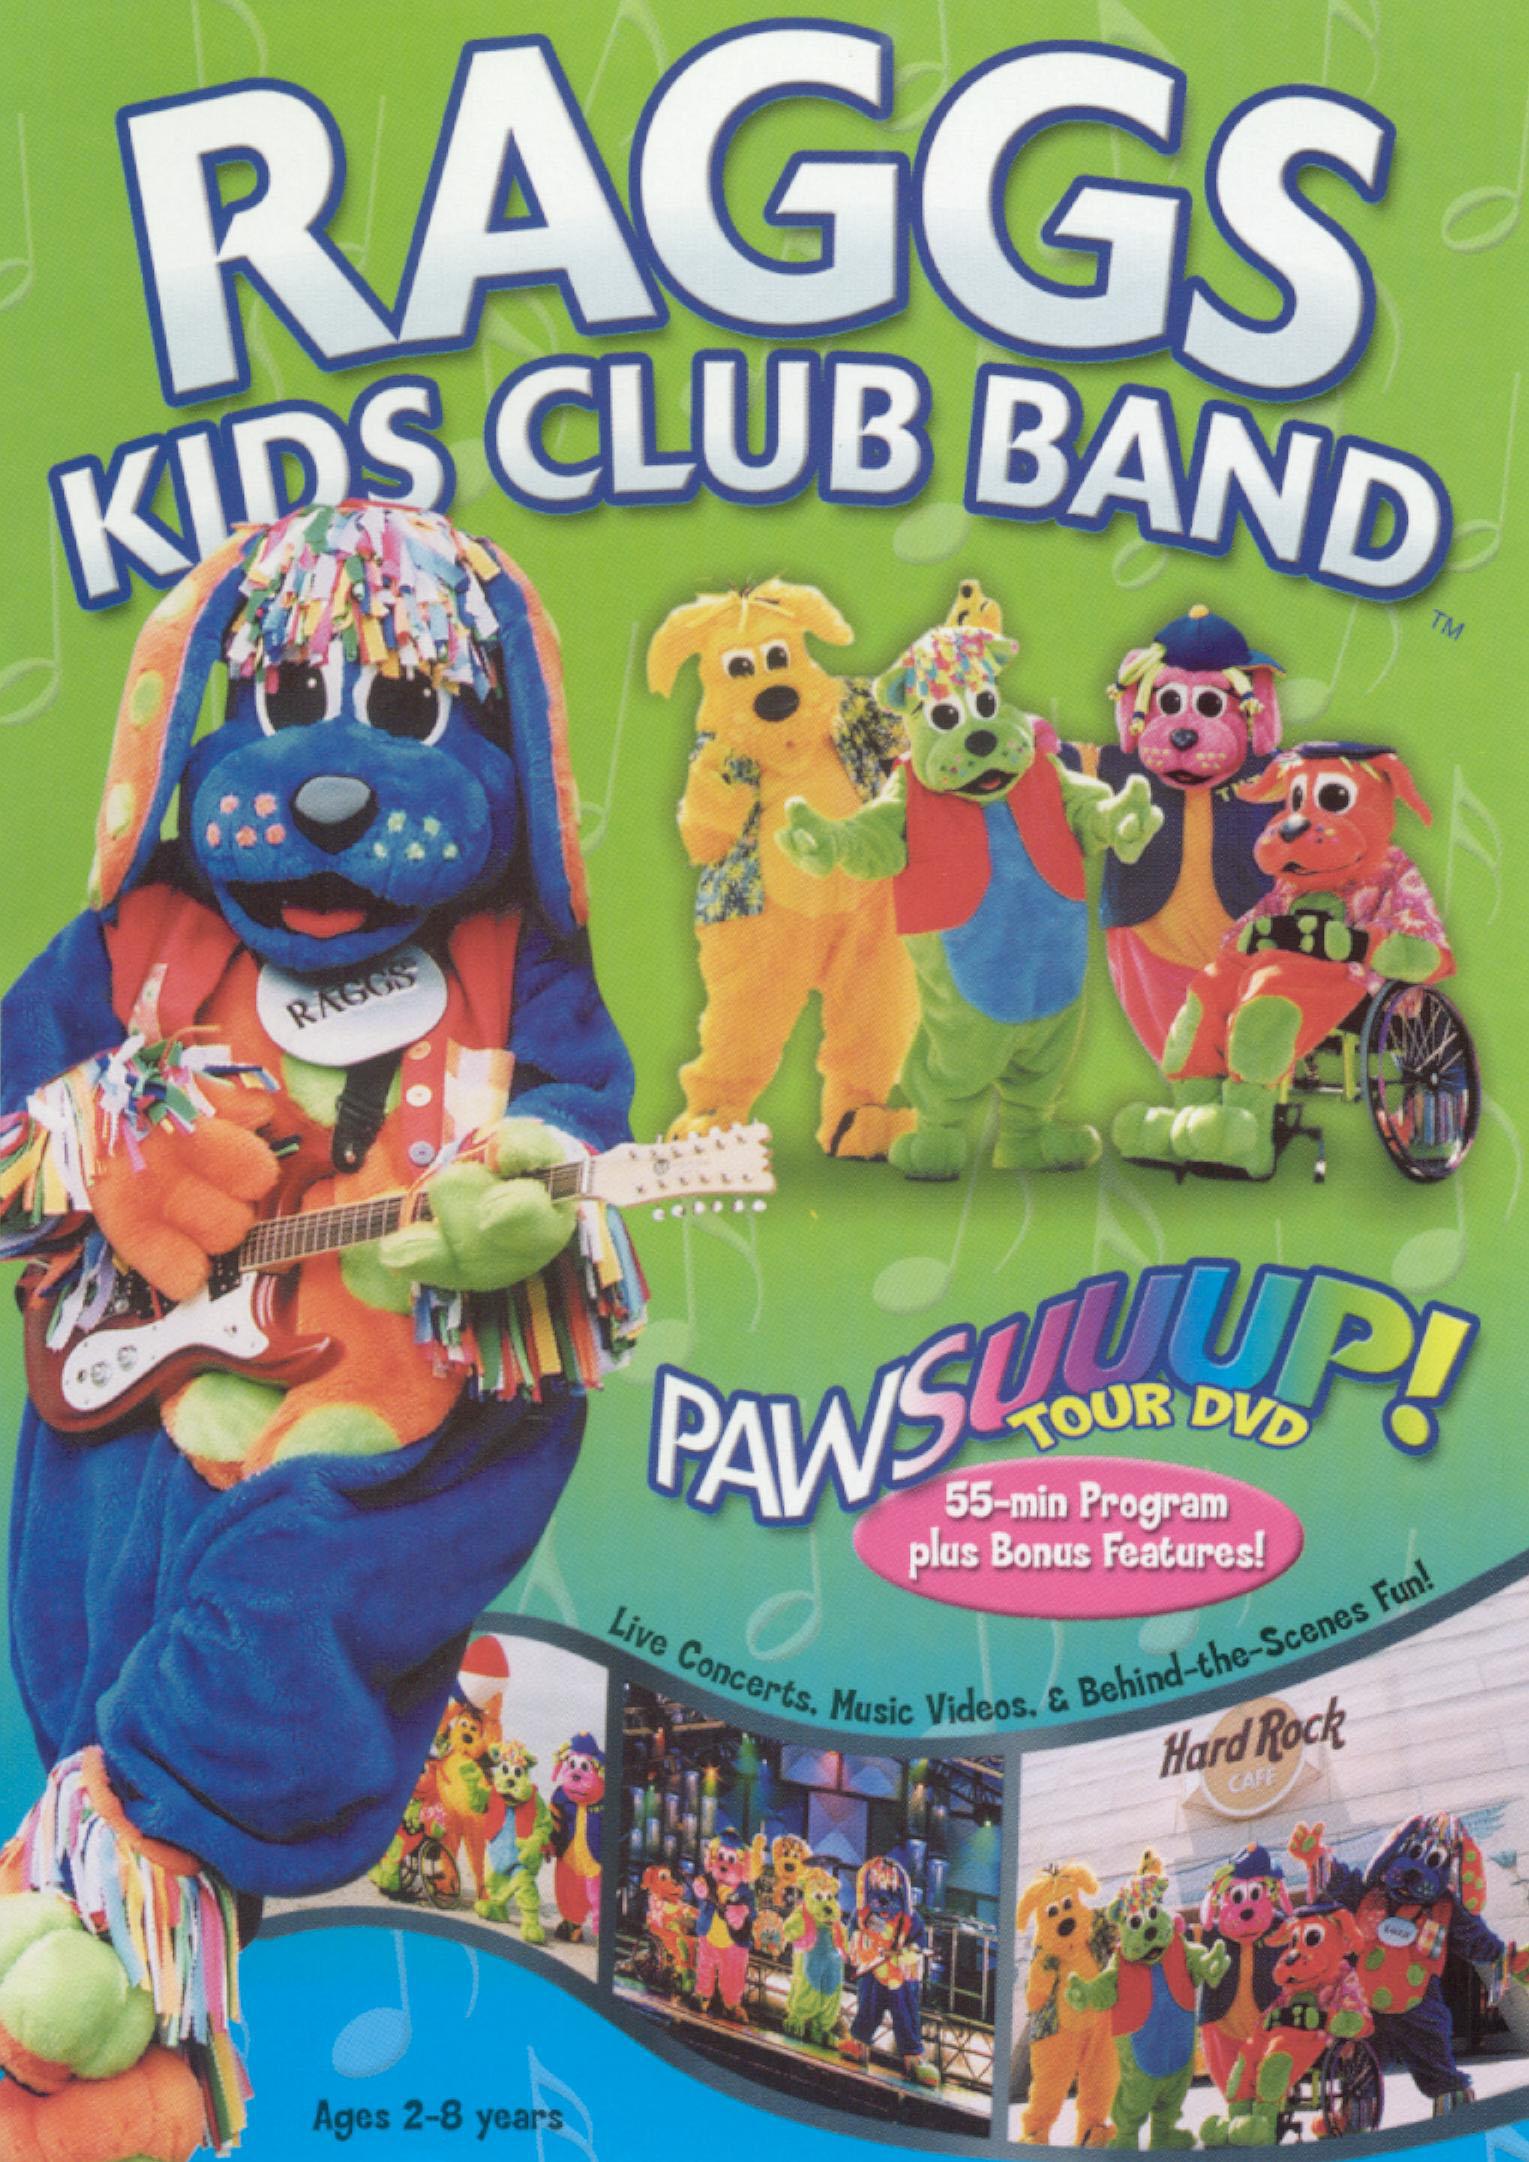 Raggs Kids Club Band: Pawsuuup!